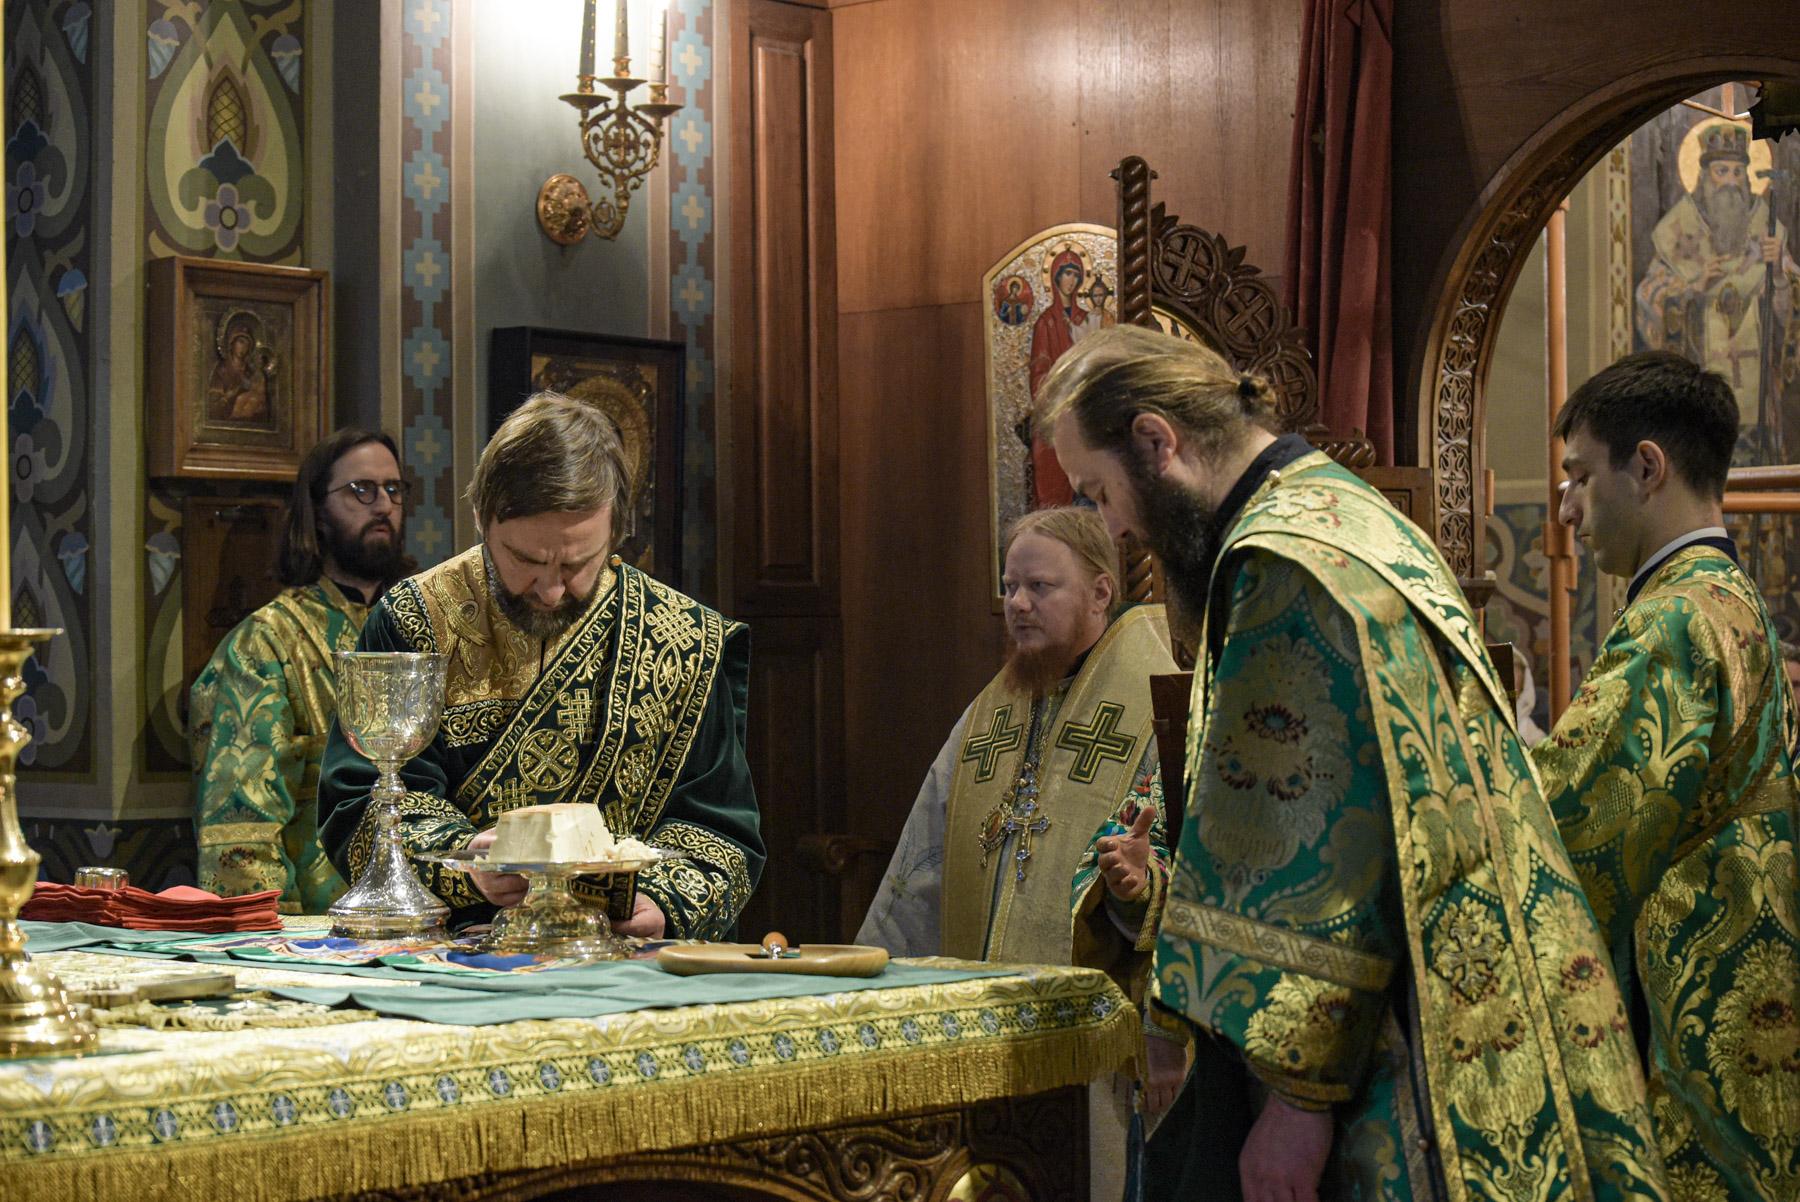 photos of orthodox christmas 0195 2